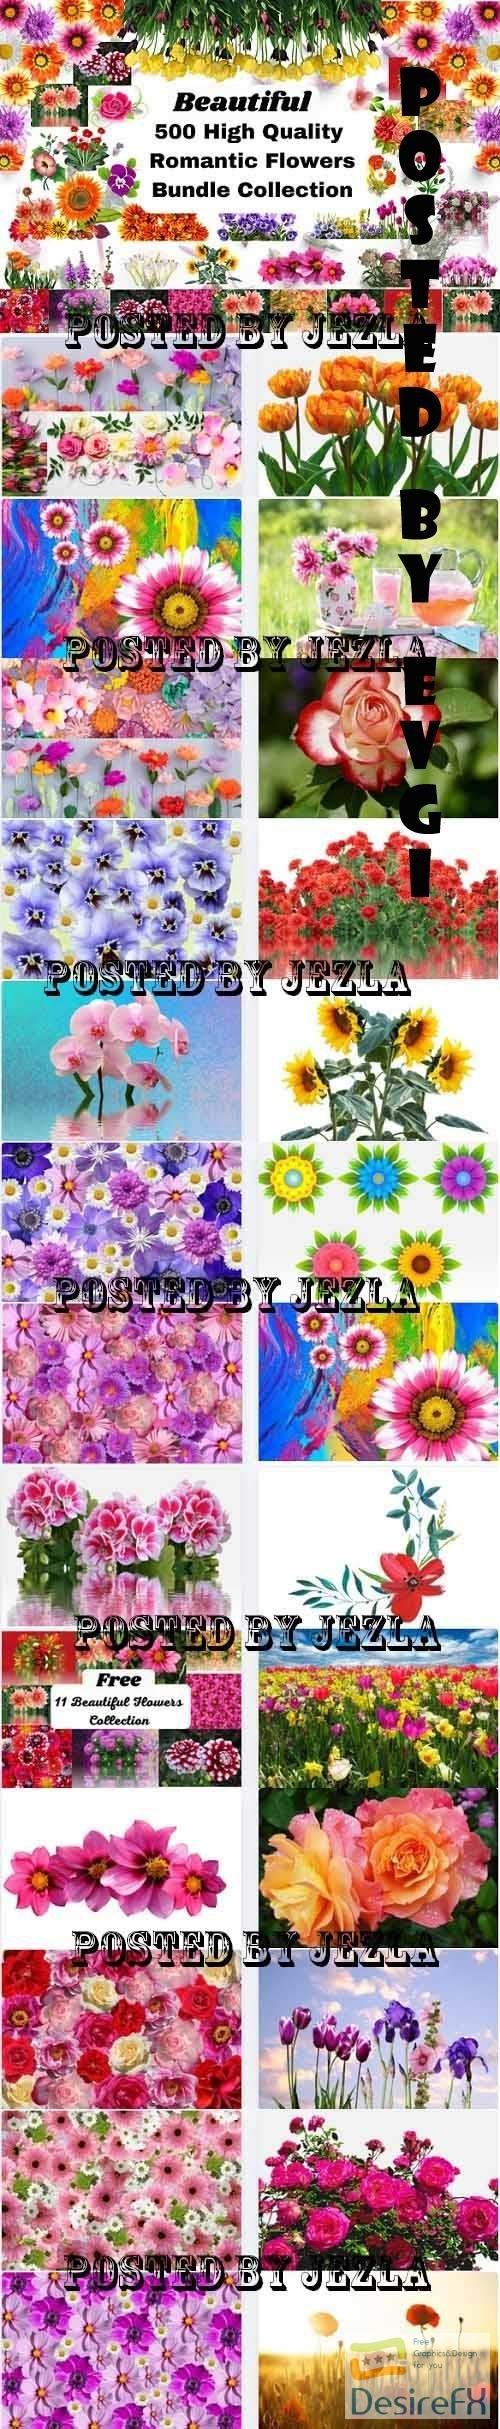 Romantic Flowers Bundle - 25 Premium Graphics